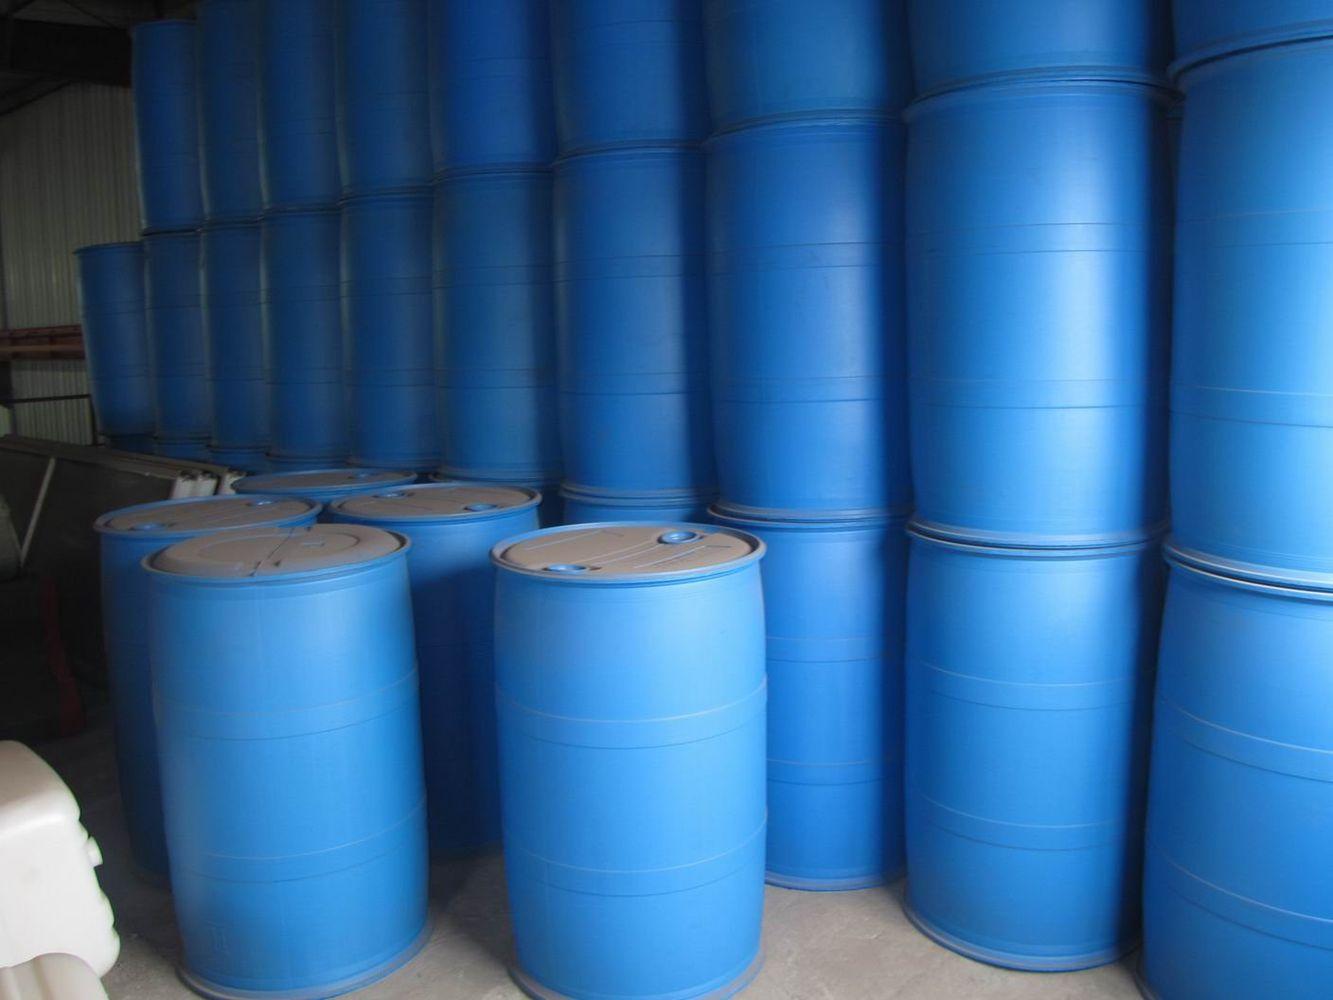 تولید بشکه پلاستیکی 220